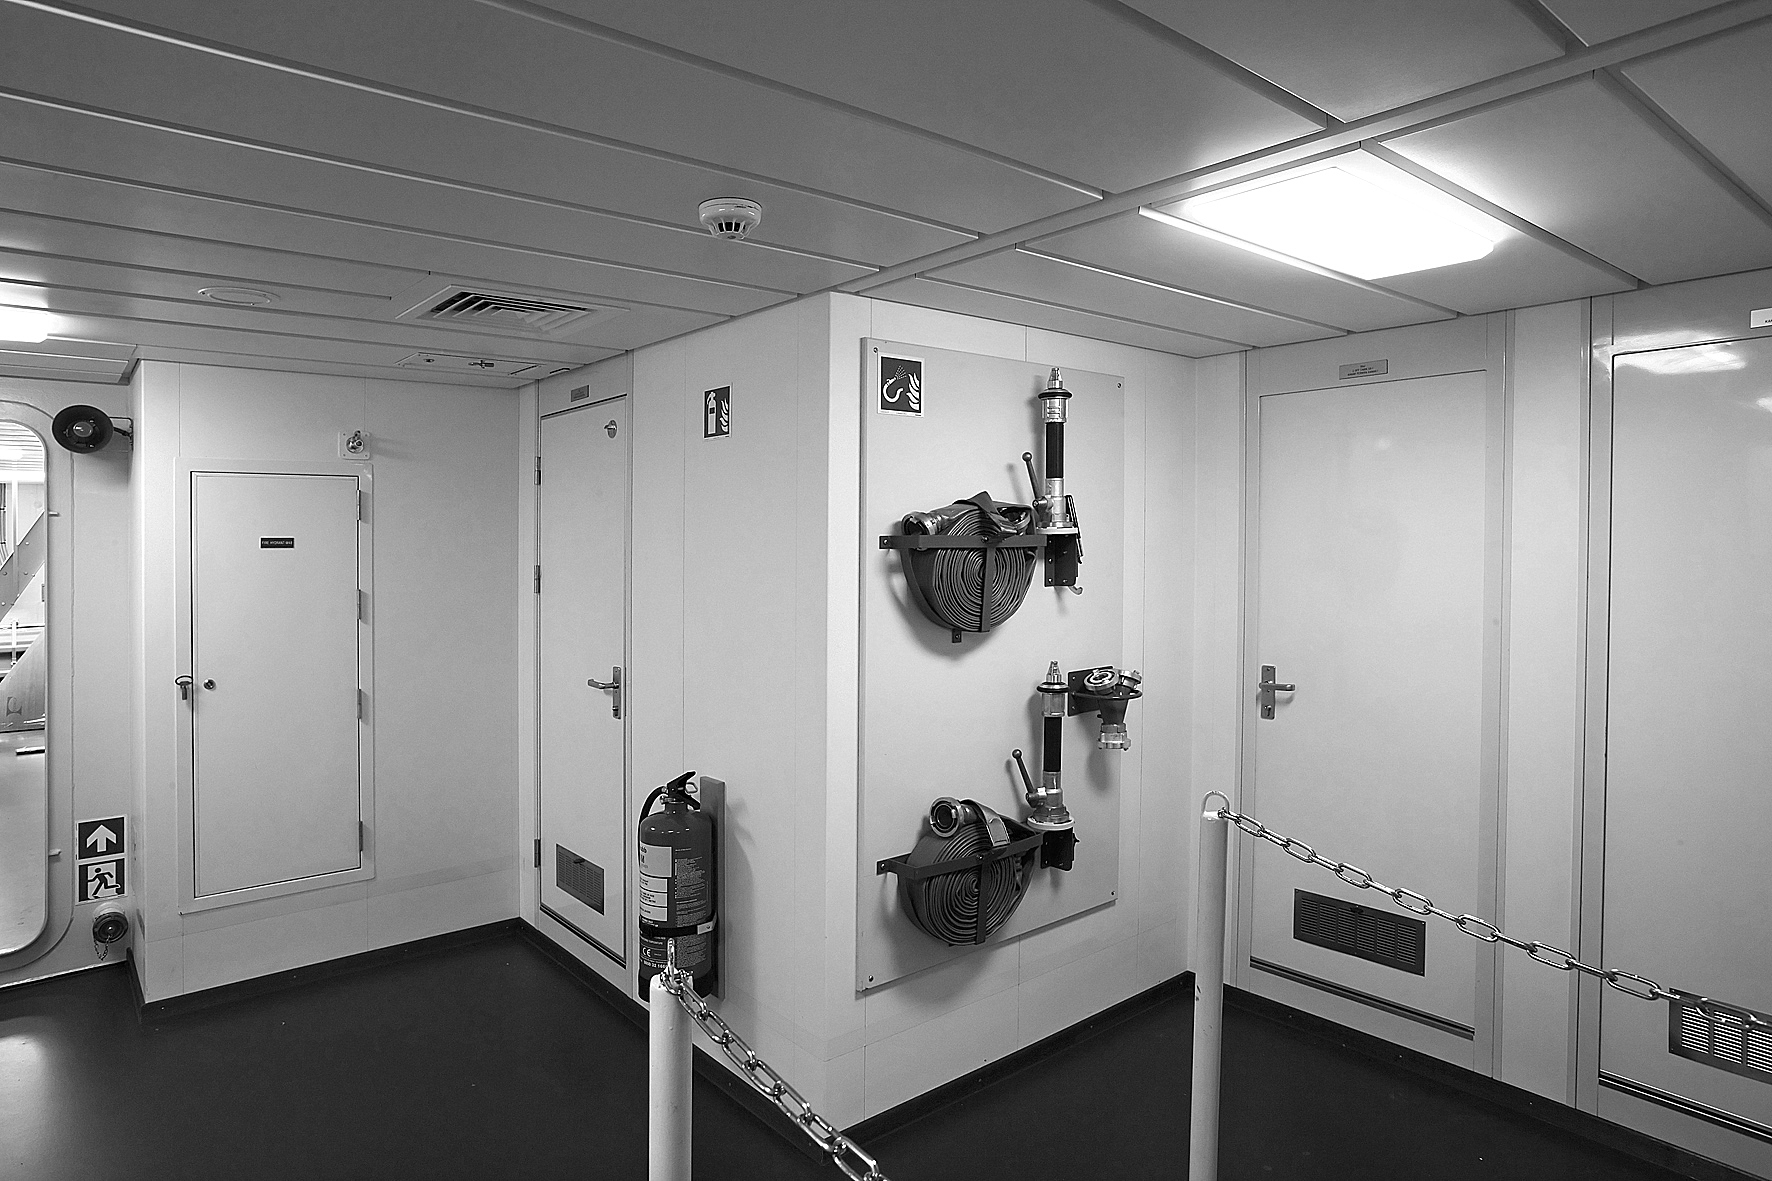 3-Panel-doors-ceiling-and-flooring-ZW